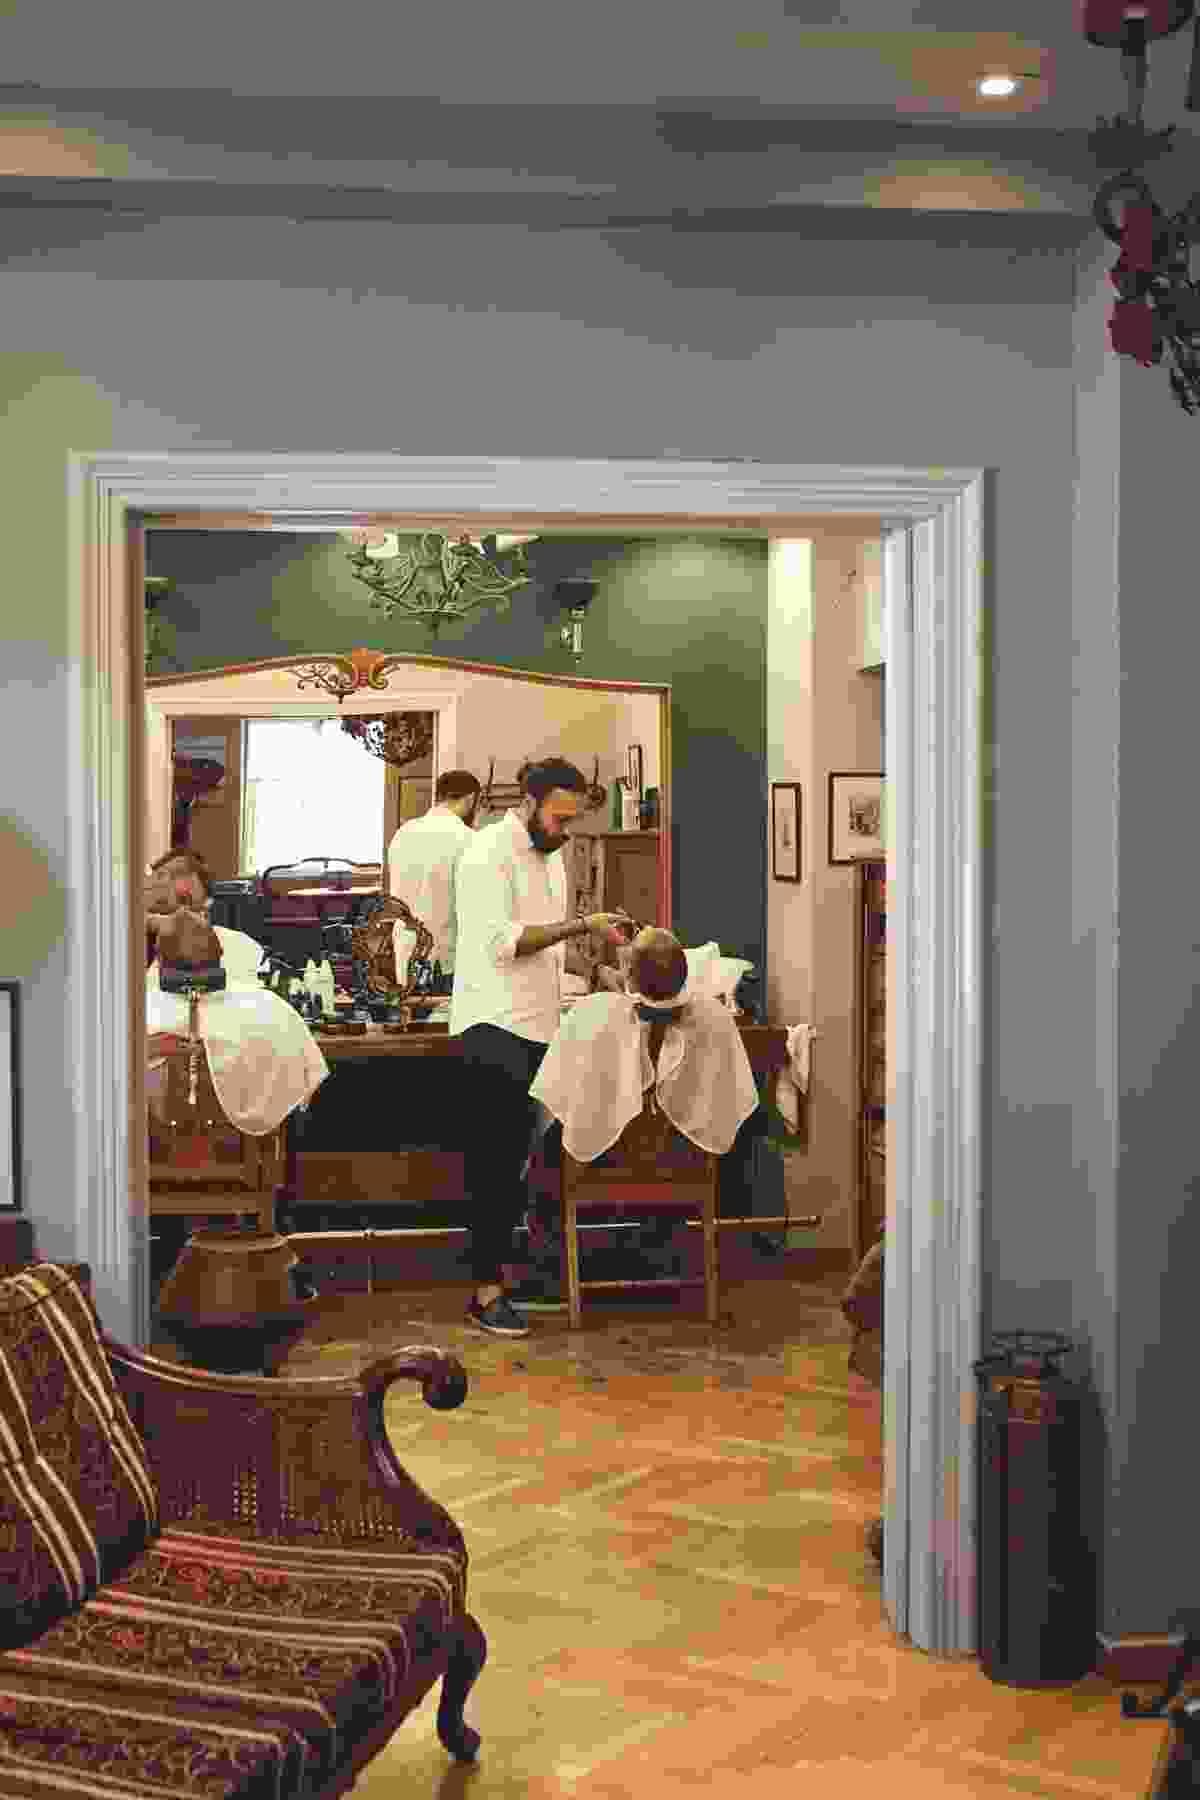 1900 The Barber Shop (Yannis Varouhakis)